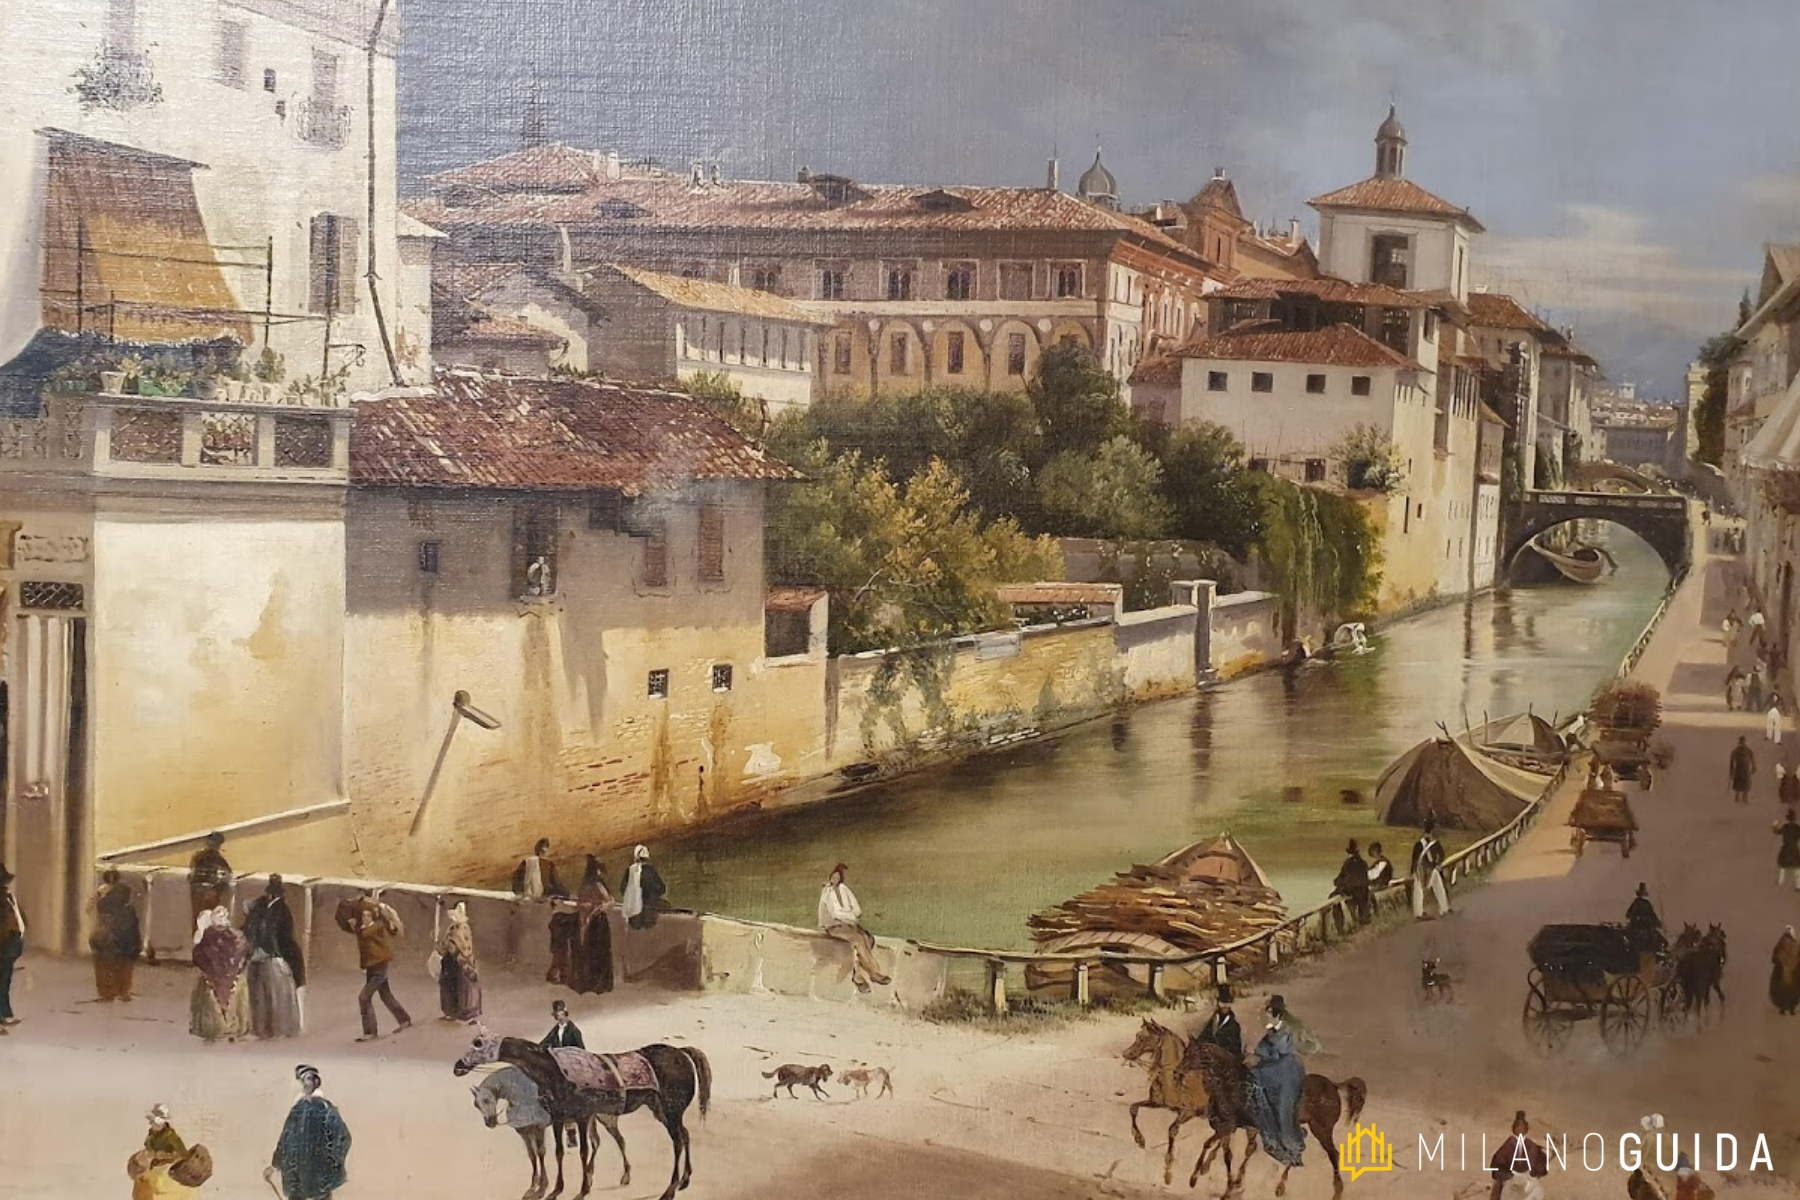 Visita guidata Museo di Milano